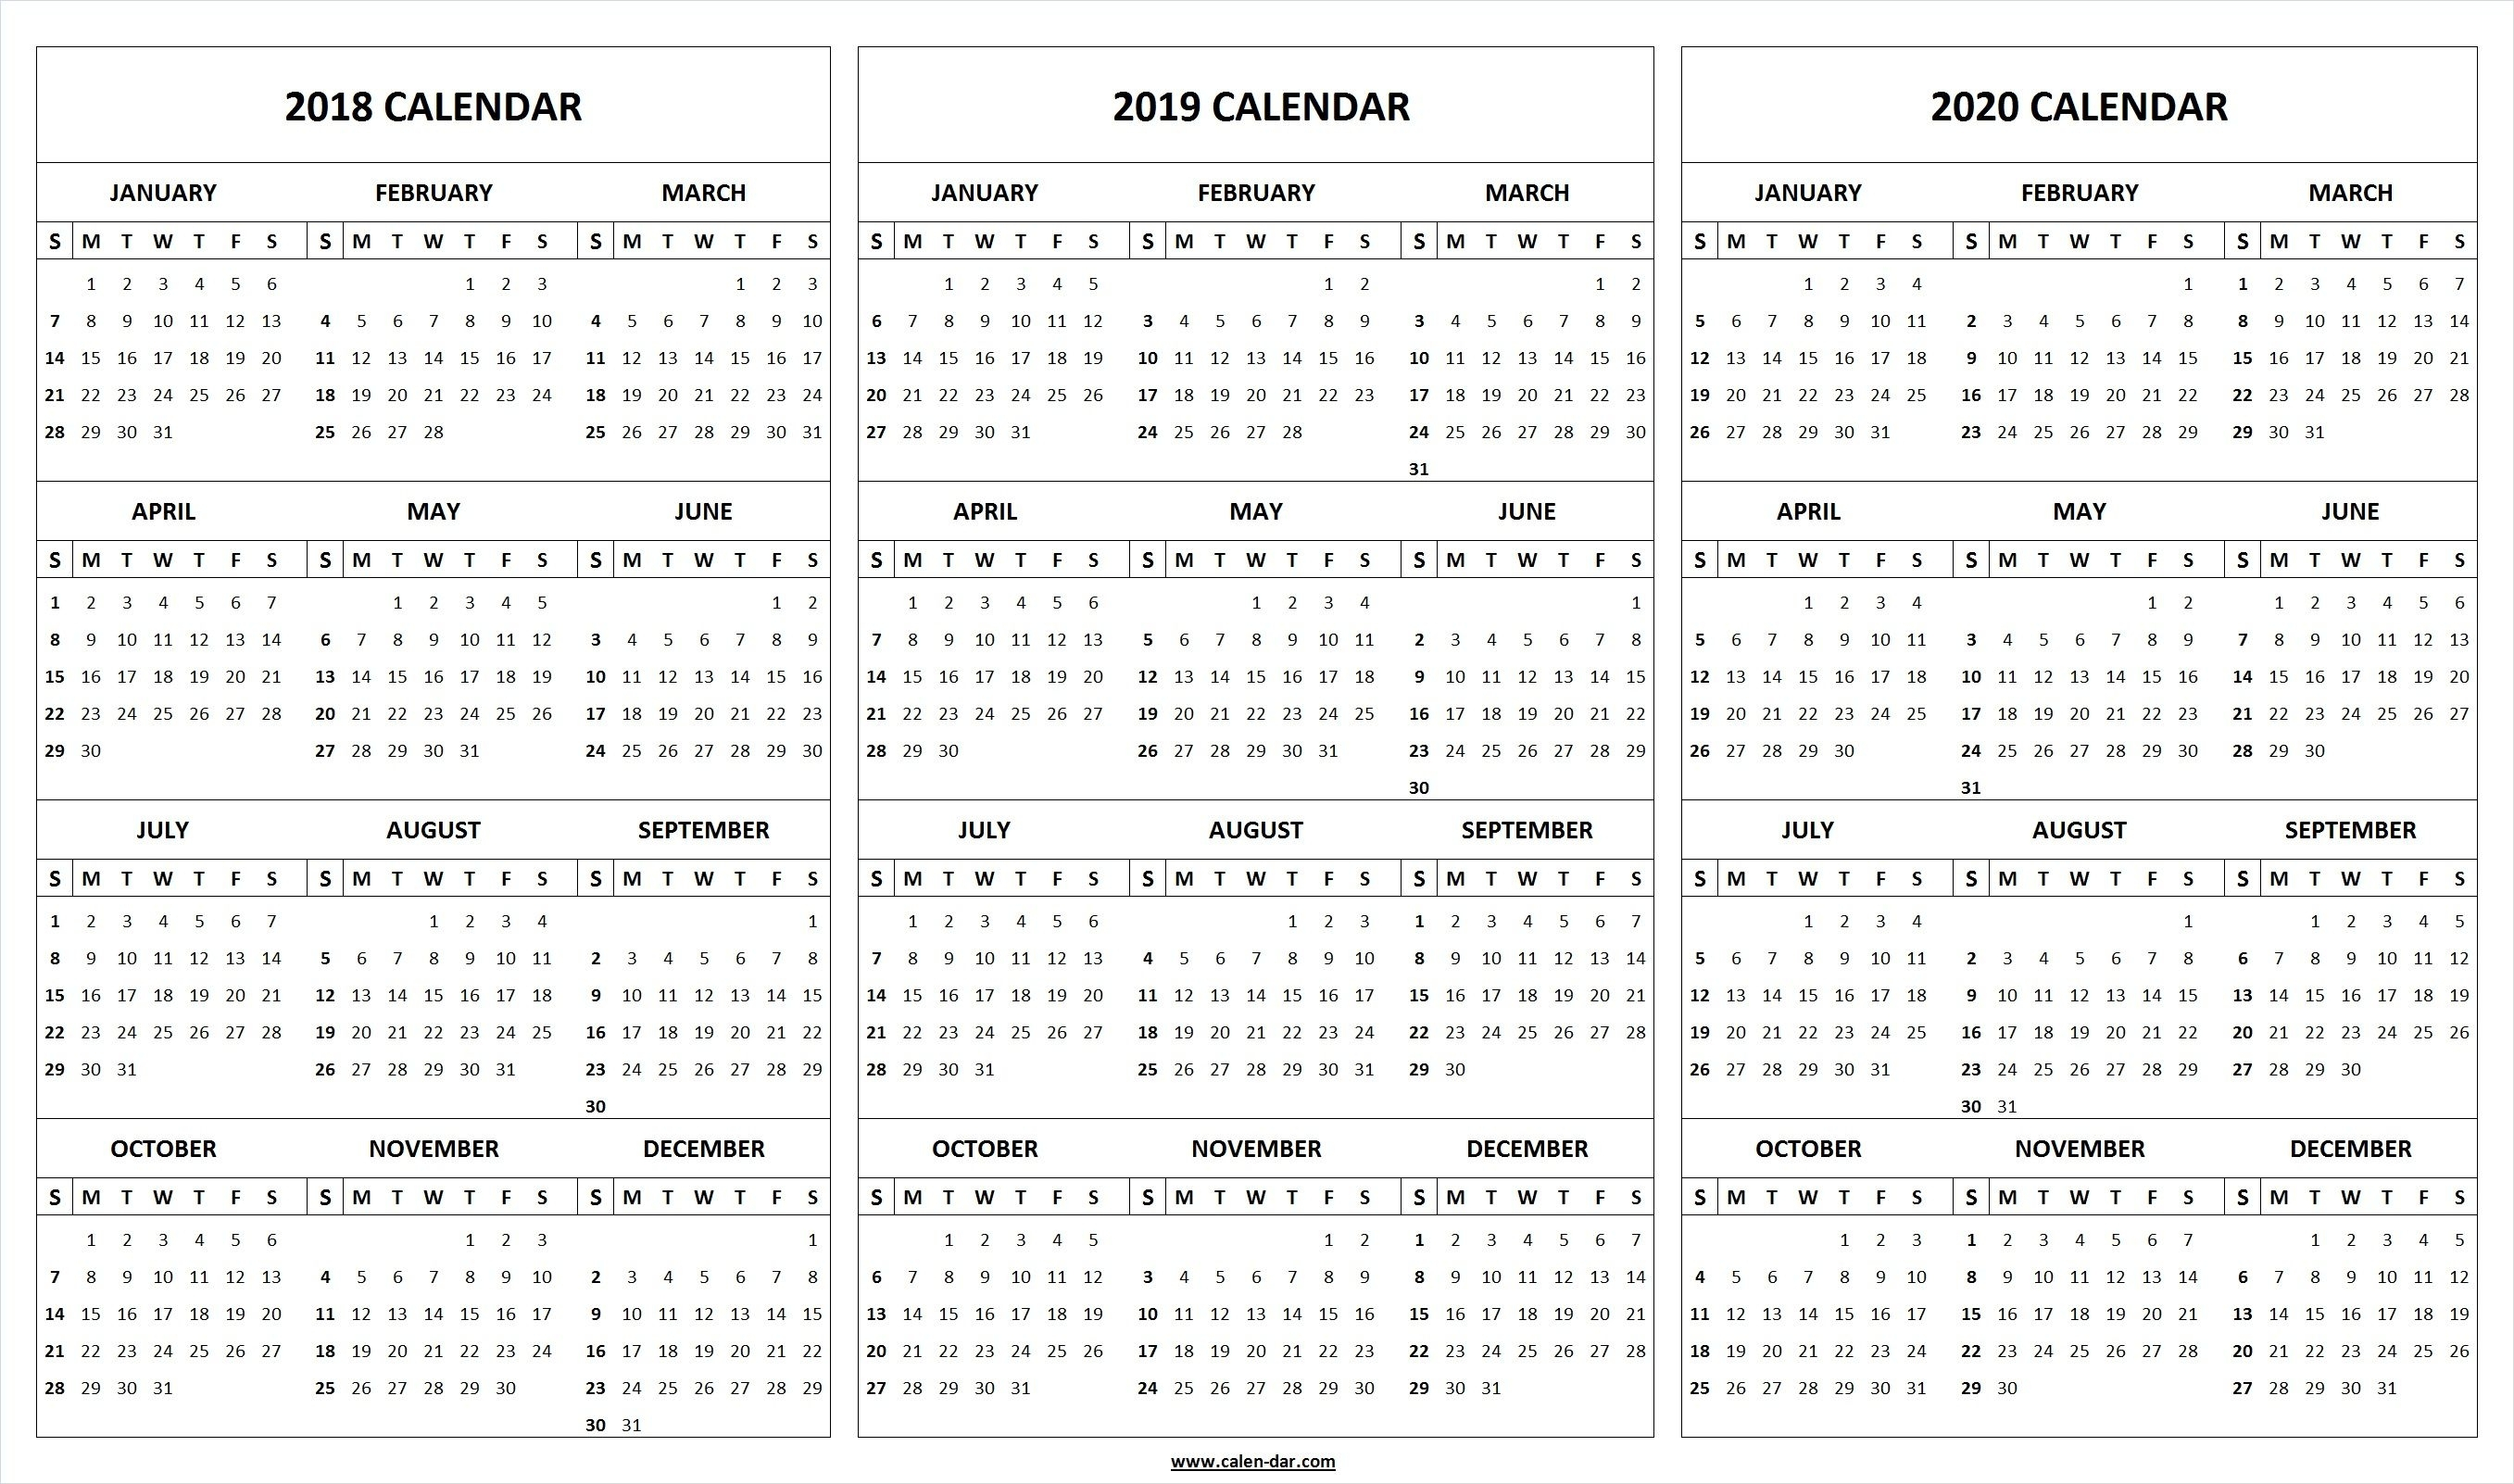 Print Blank 2018 2019 2020 Calendar Template   Organize!   Printable for Year At A Glance Printable Calendar 2019/2020